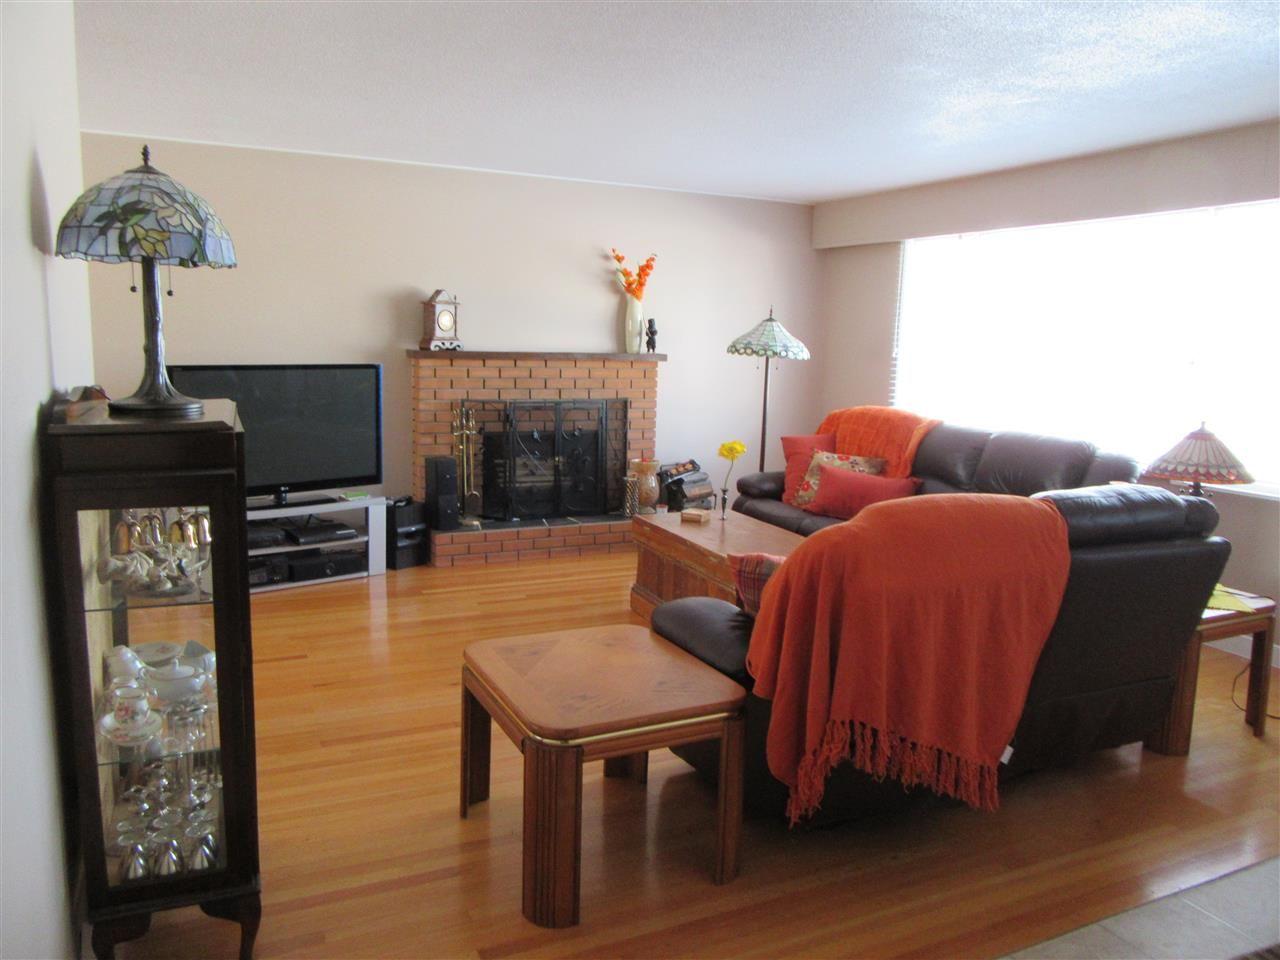 Photo 4: Photos: 522 RADCLIFFE Drive: Quinson House for sale (PG City West (Zone 71))  : MLS®# R2433646